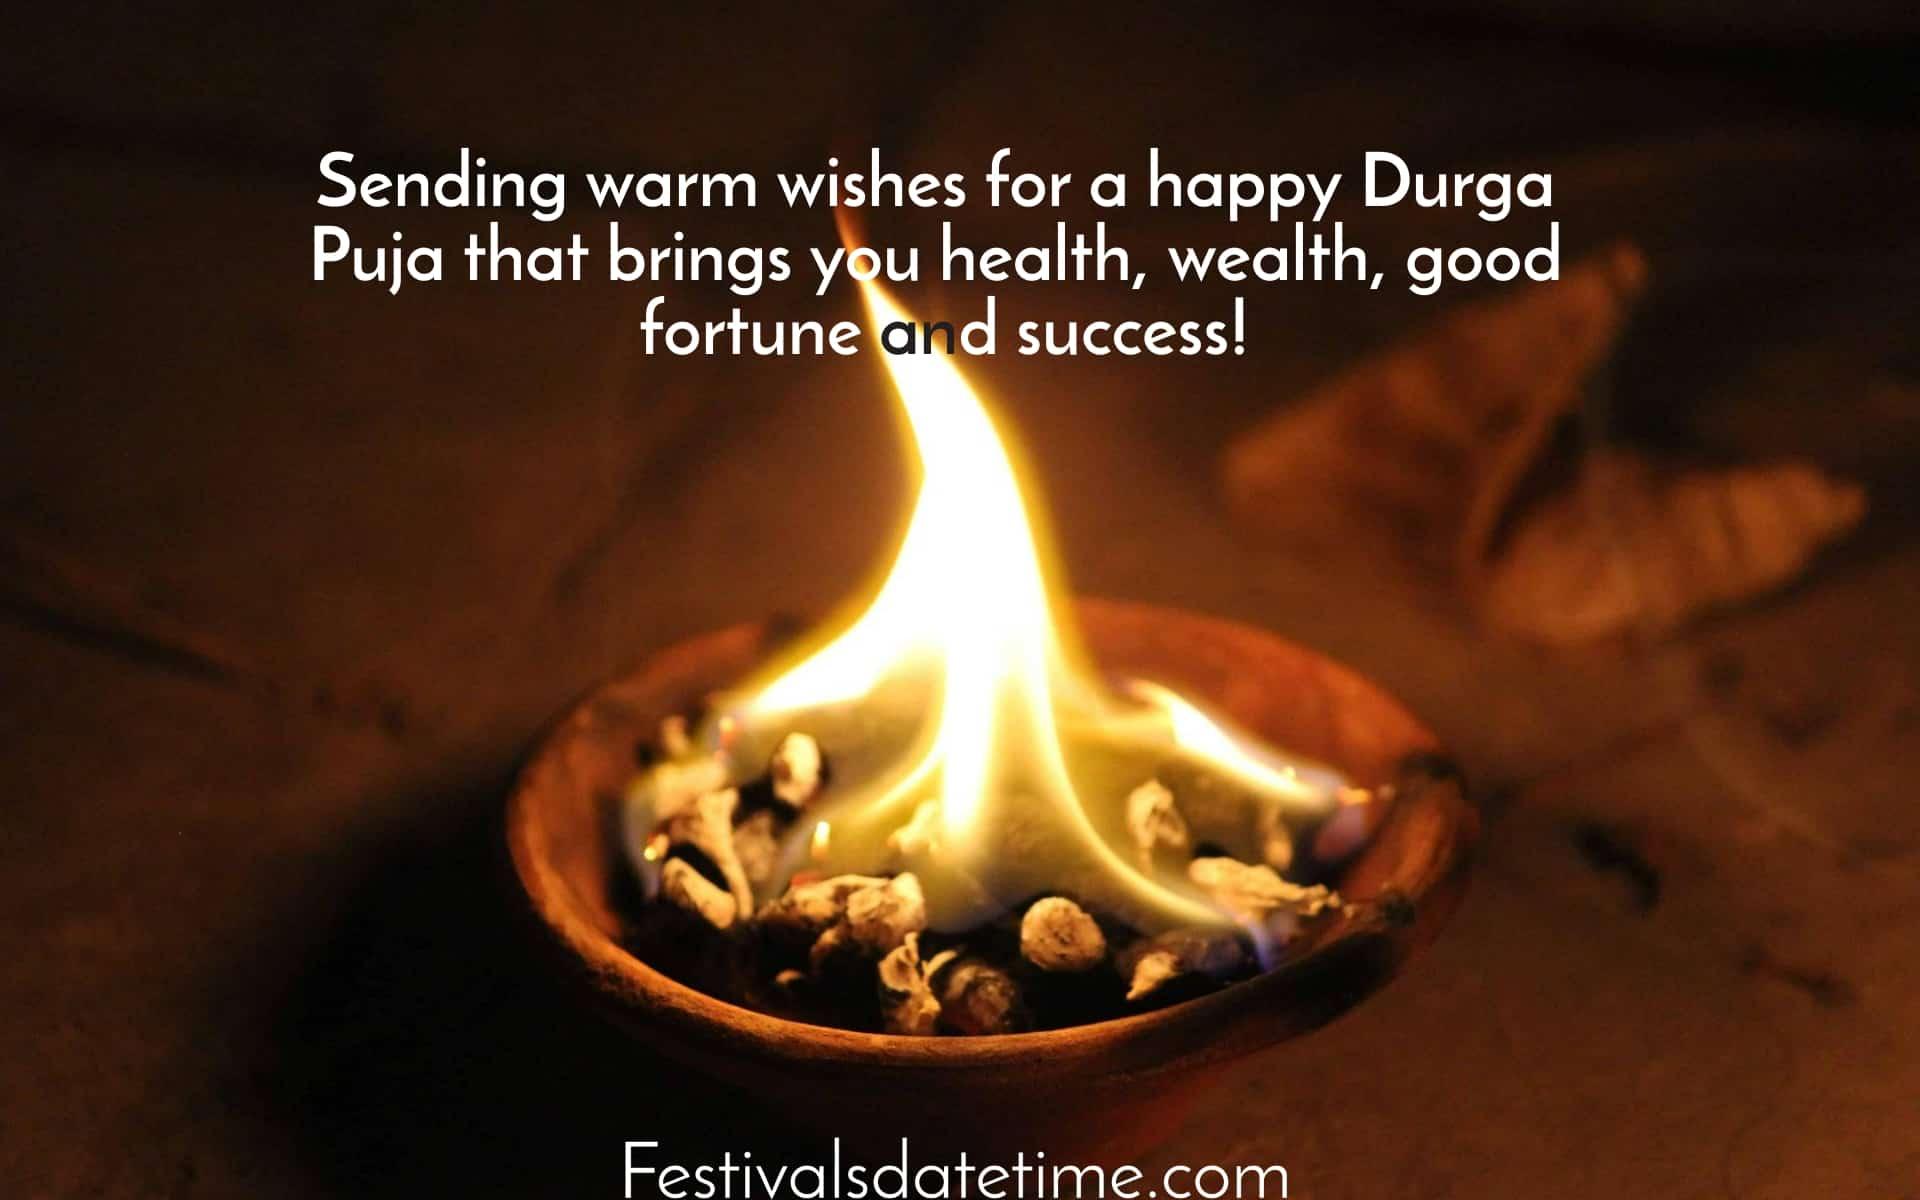 durga_puja_wish_message